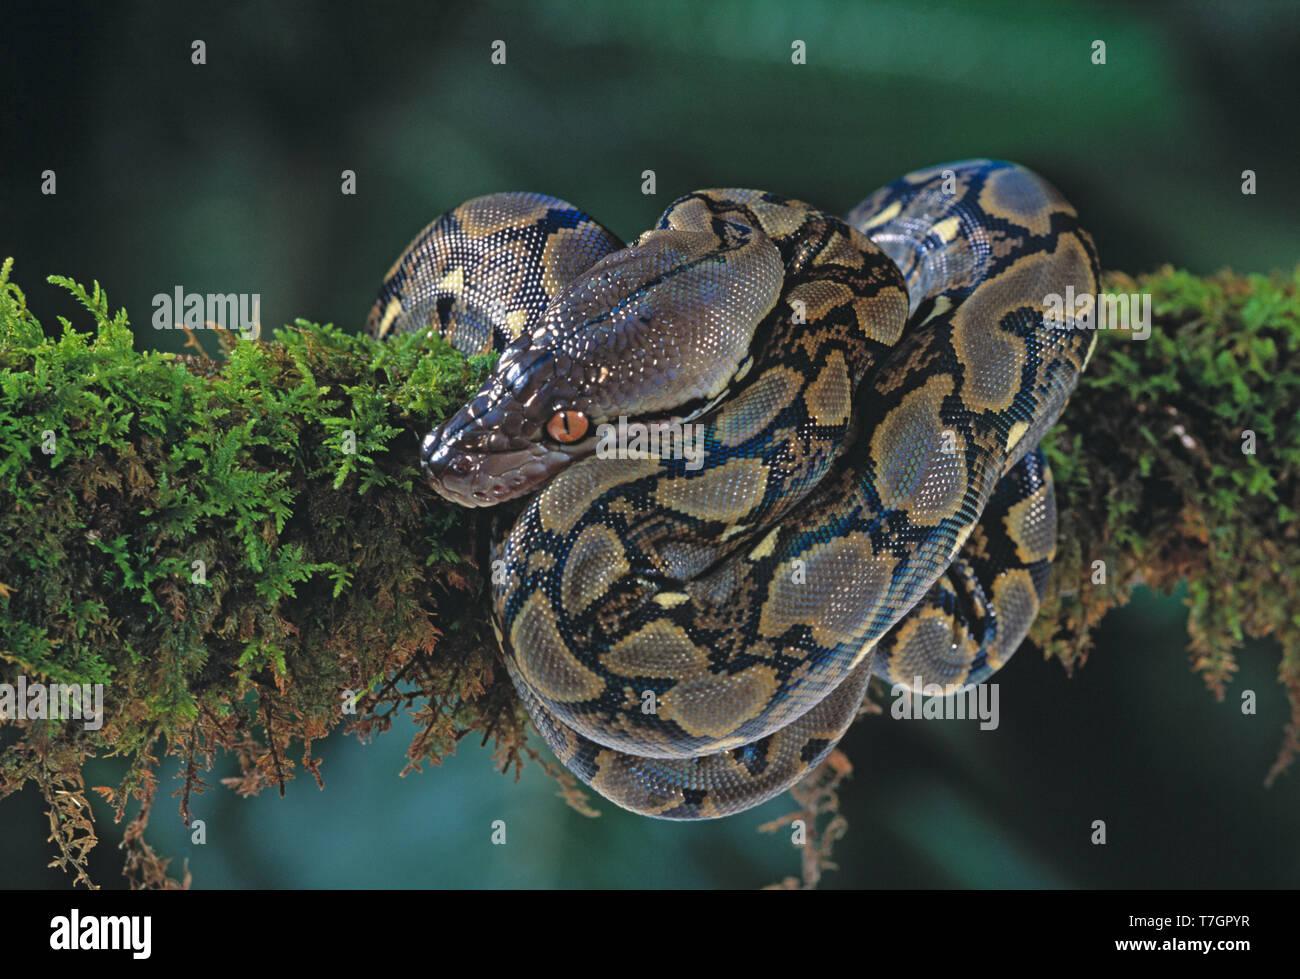 Indonesia. Sumatra. Wildlife. Snake. Reticulated Python. Python reticulatus. - Stock Image